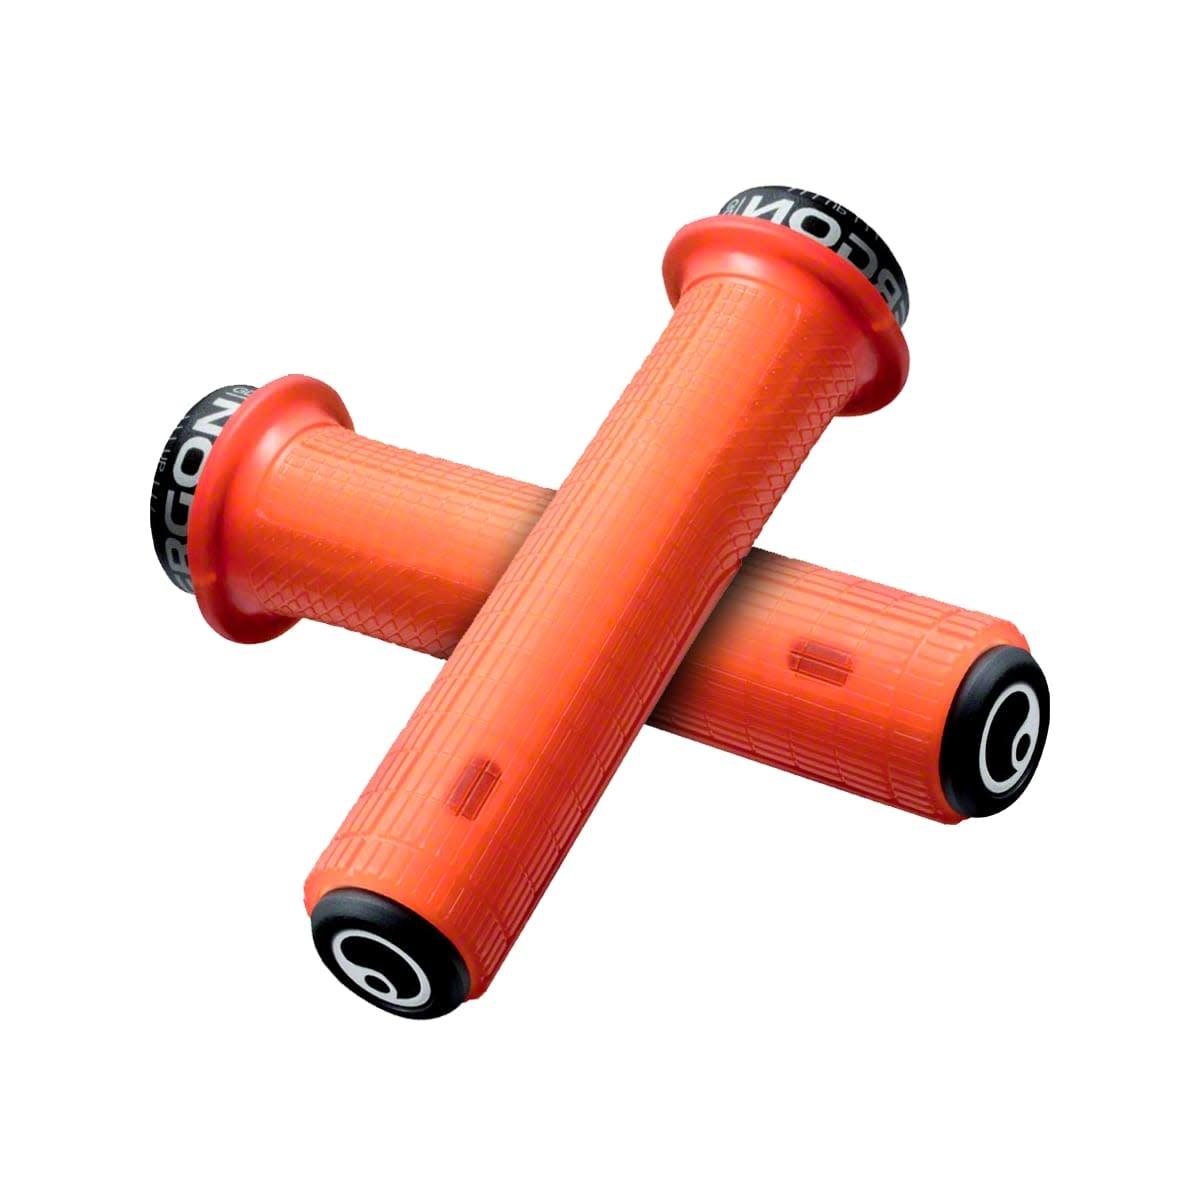 Ergon GD1 Evo Factory Grips, Regular - Frozen Orange  NLA>